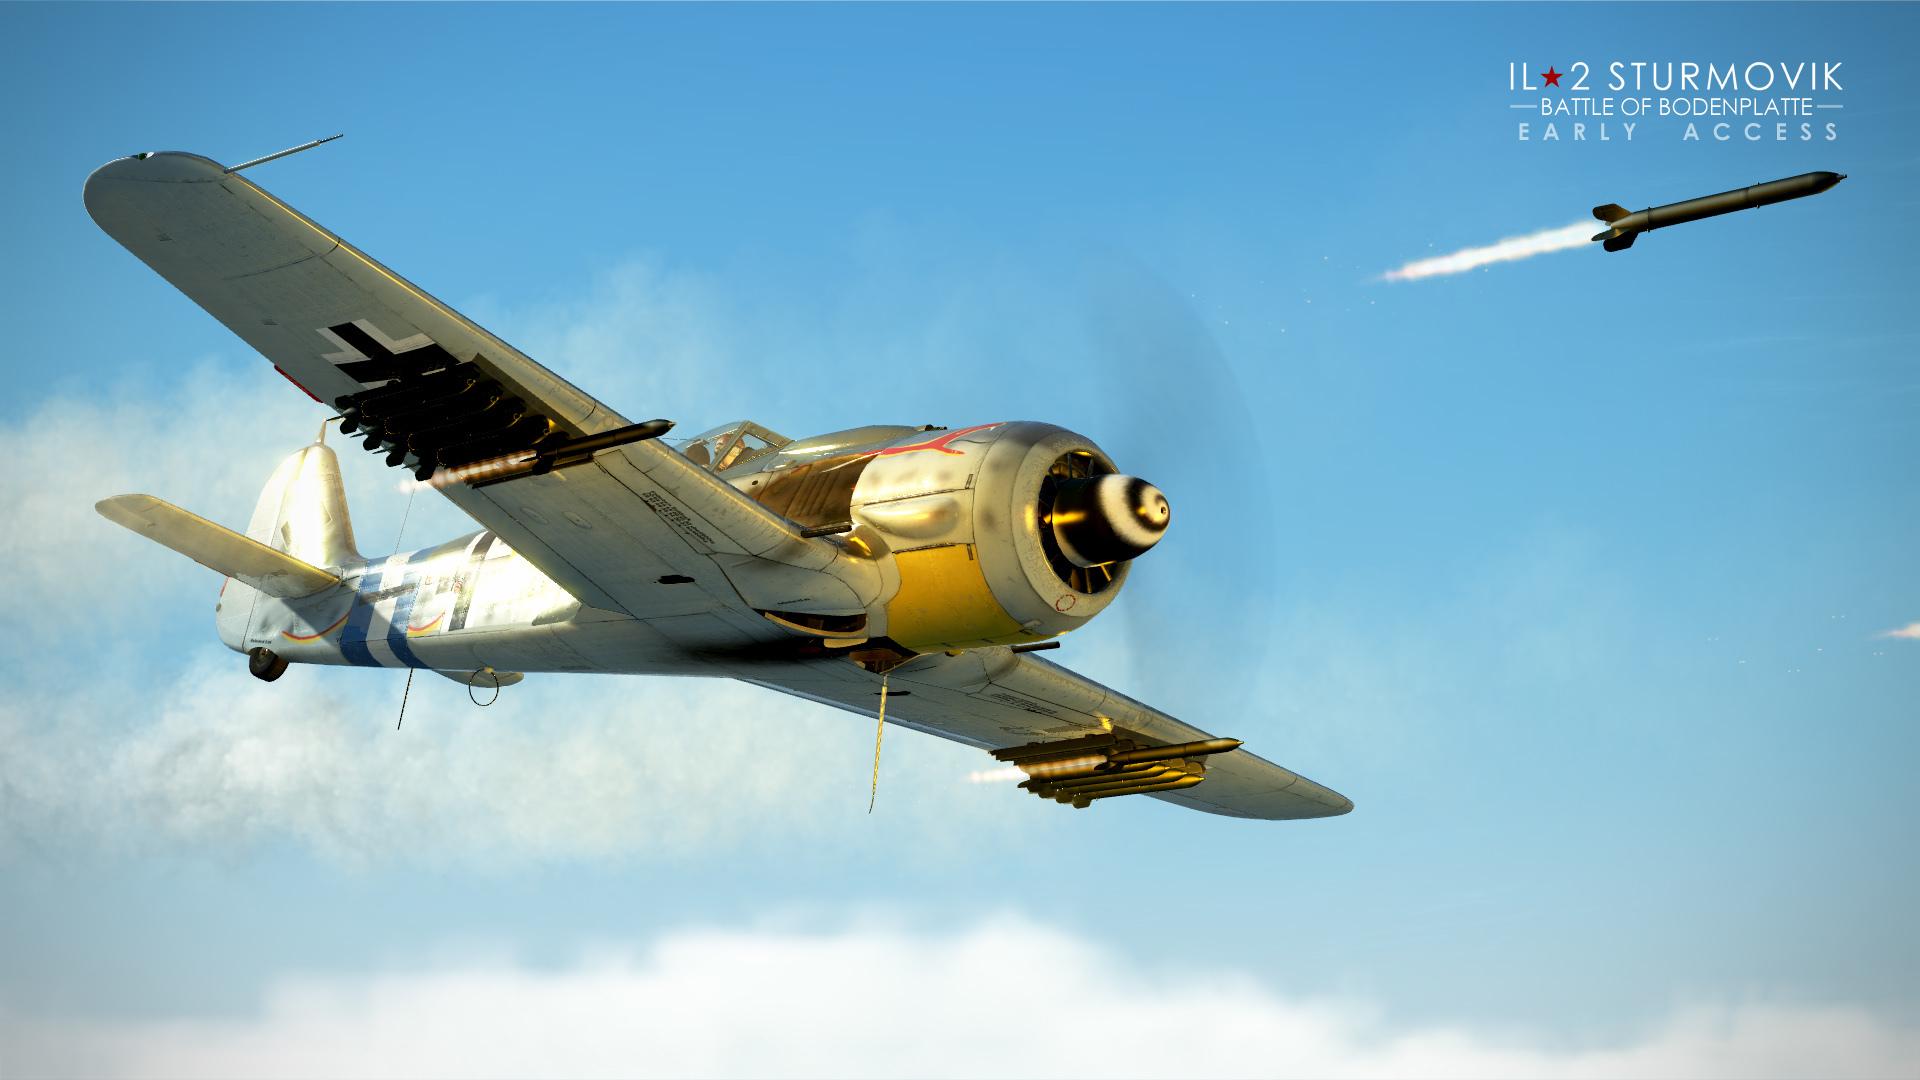 Обои Bf 109 k4, war, painting, german fighter, ww2, aviation. Авиация foto 19